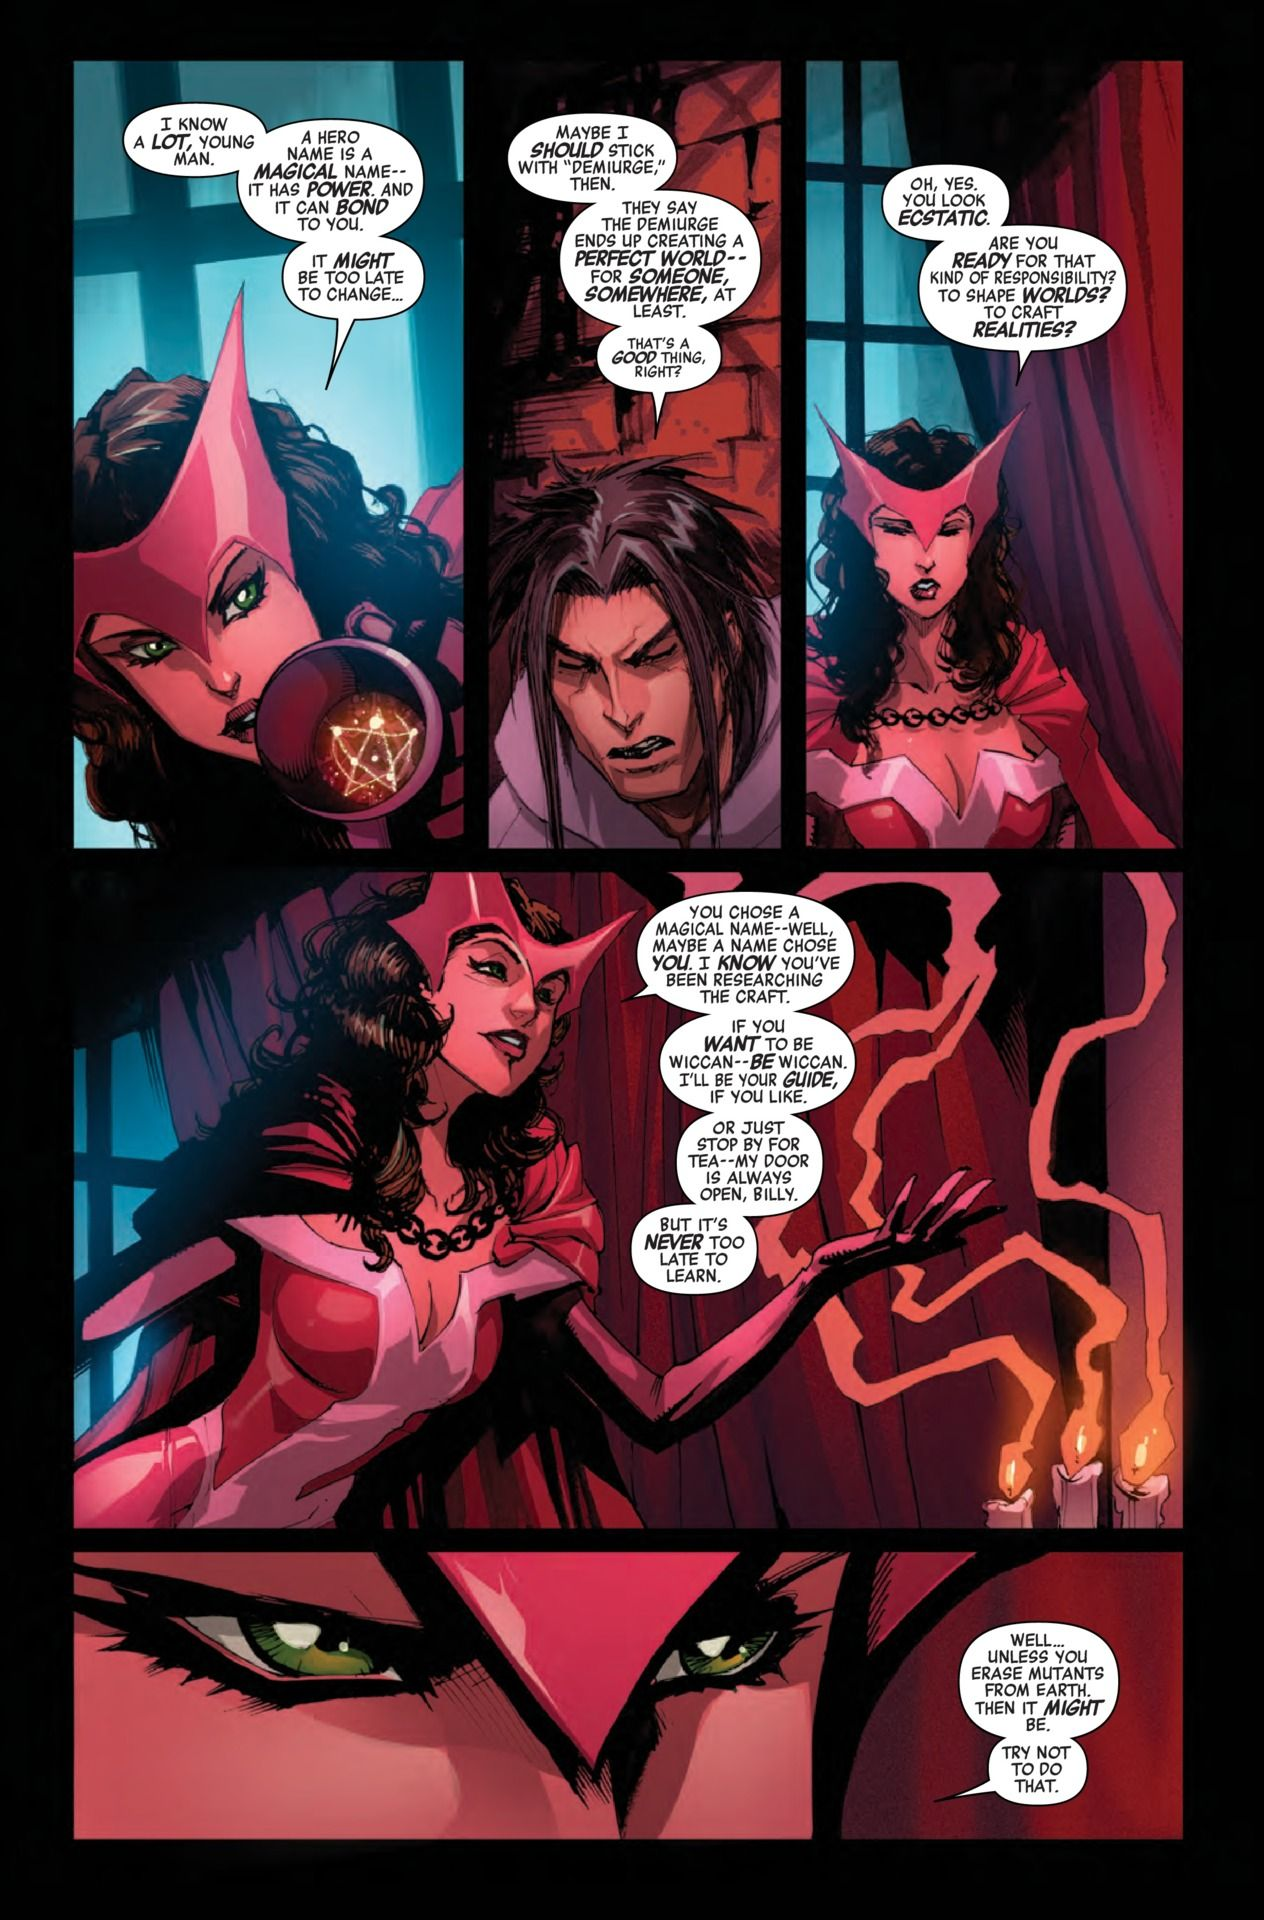 Preview New Avengers 11 Comic Vine In 2020 Scarlet Witch Comic Scarlet Witch Cosplay Scarlet Witch